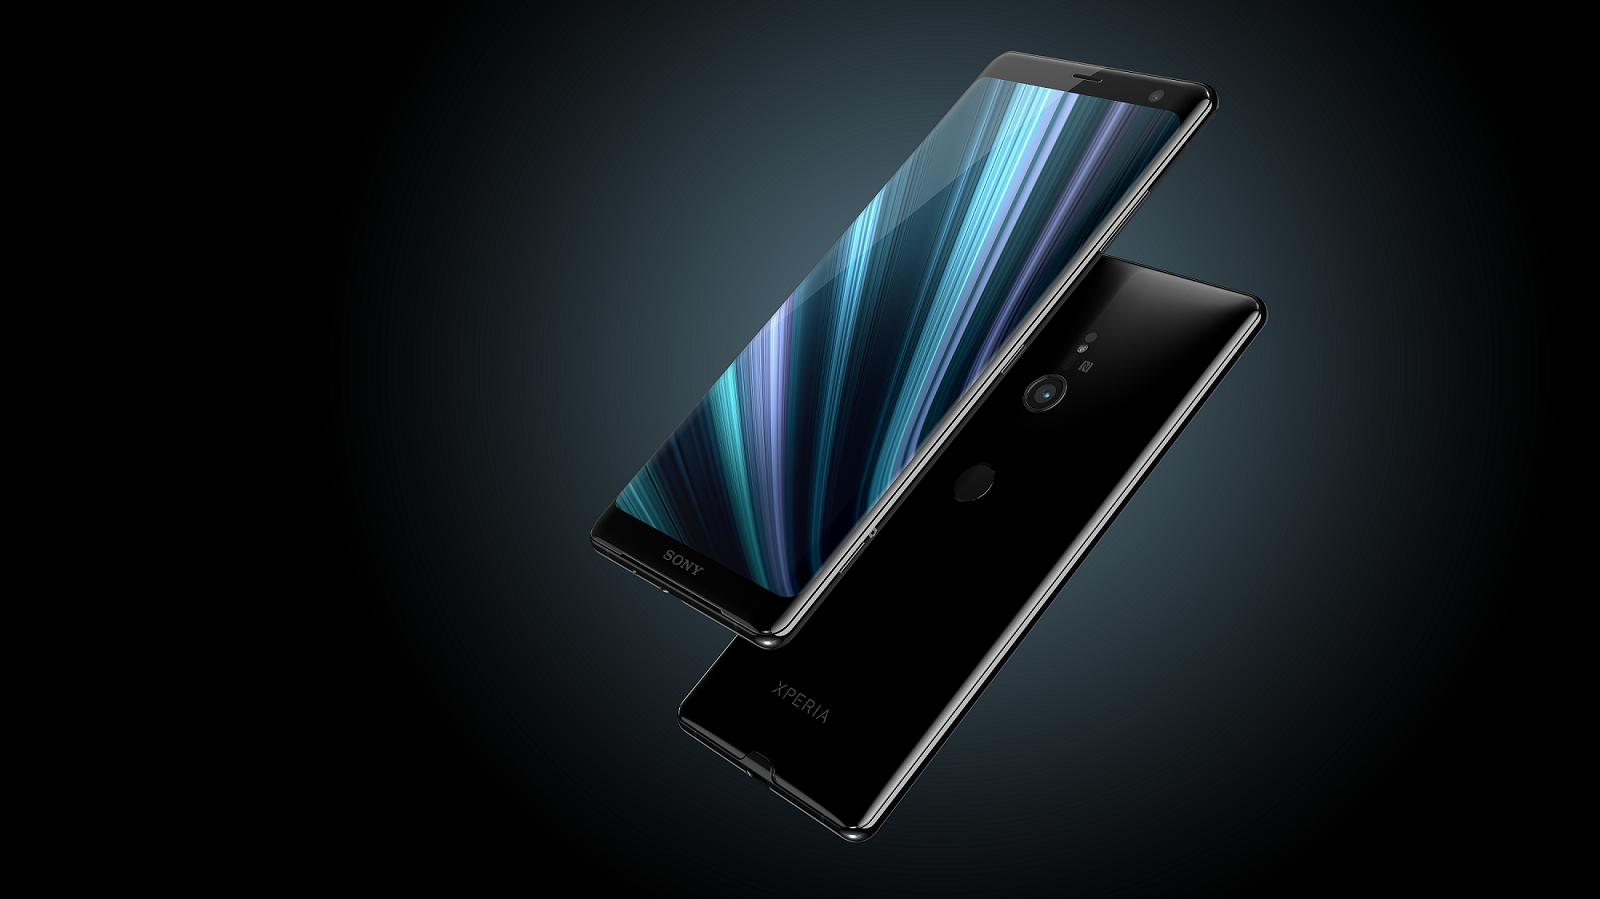 Sony Xperia XZ3 bude stát 19 990 Kč [aktualizováno]